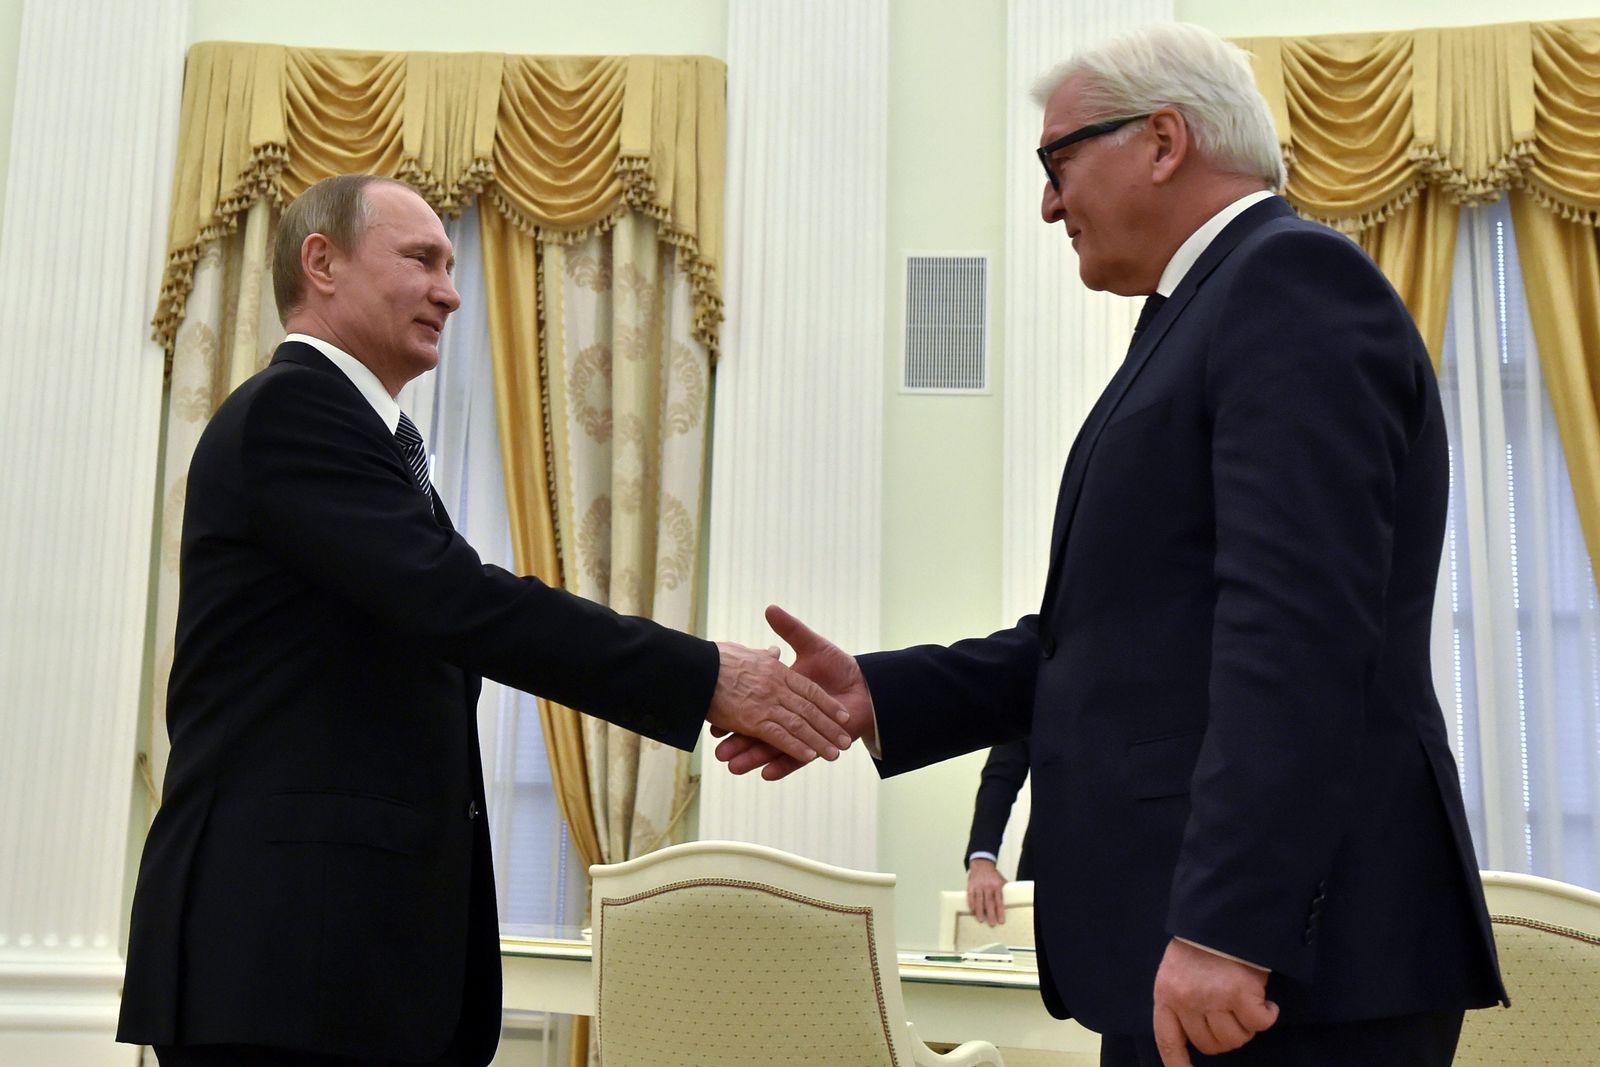 German Foreign Minister Frank-Walter Steinmeier visits